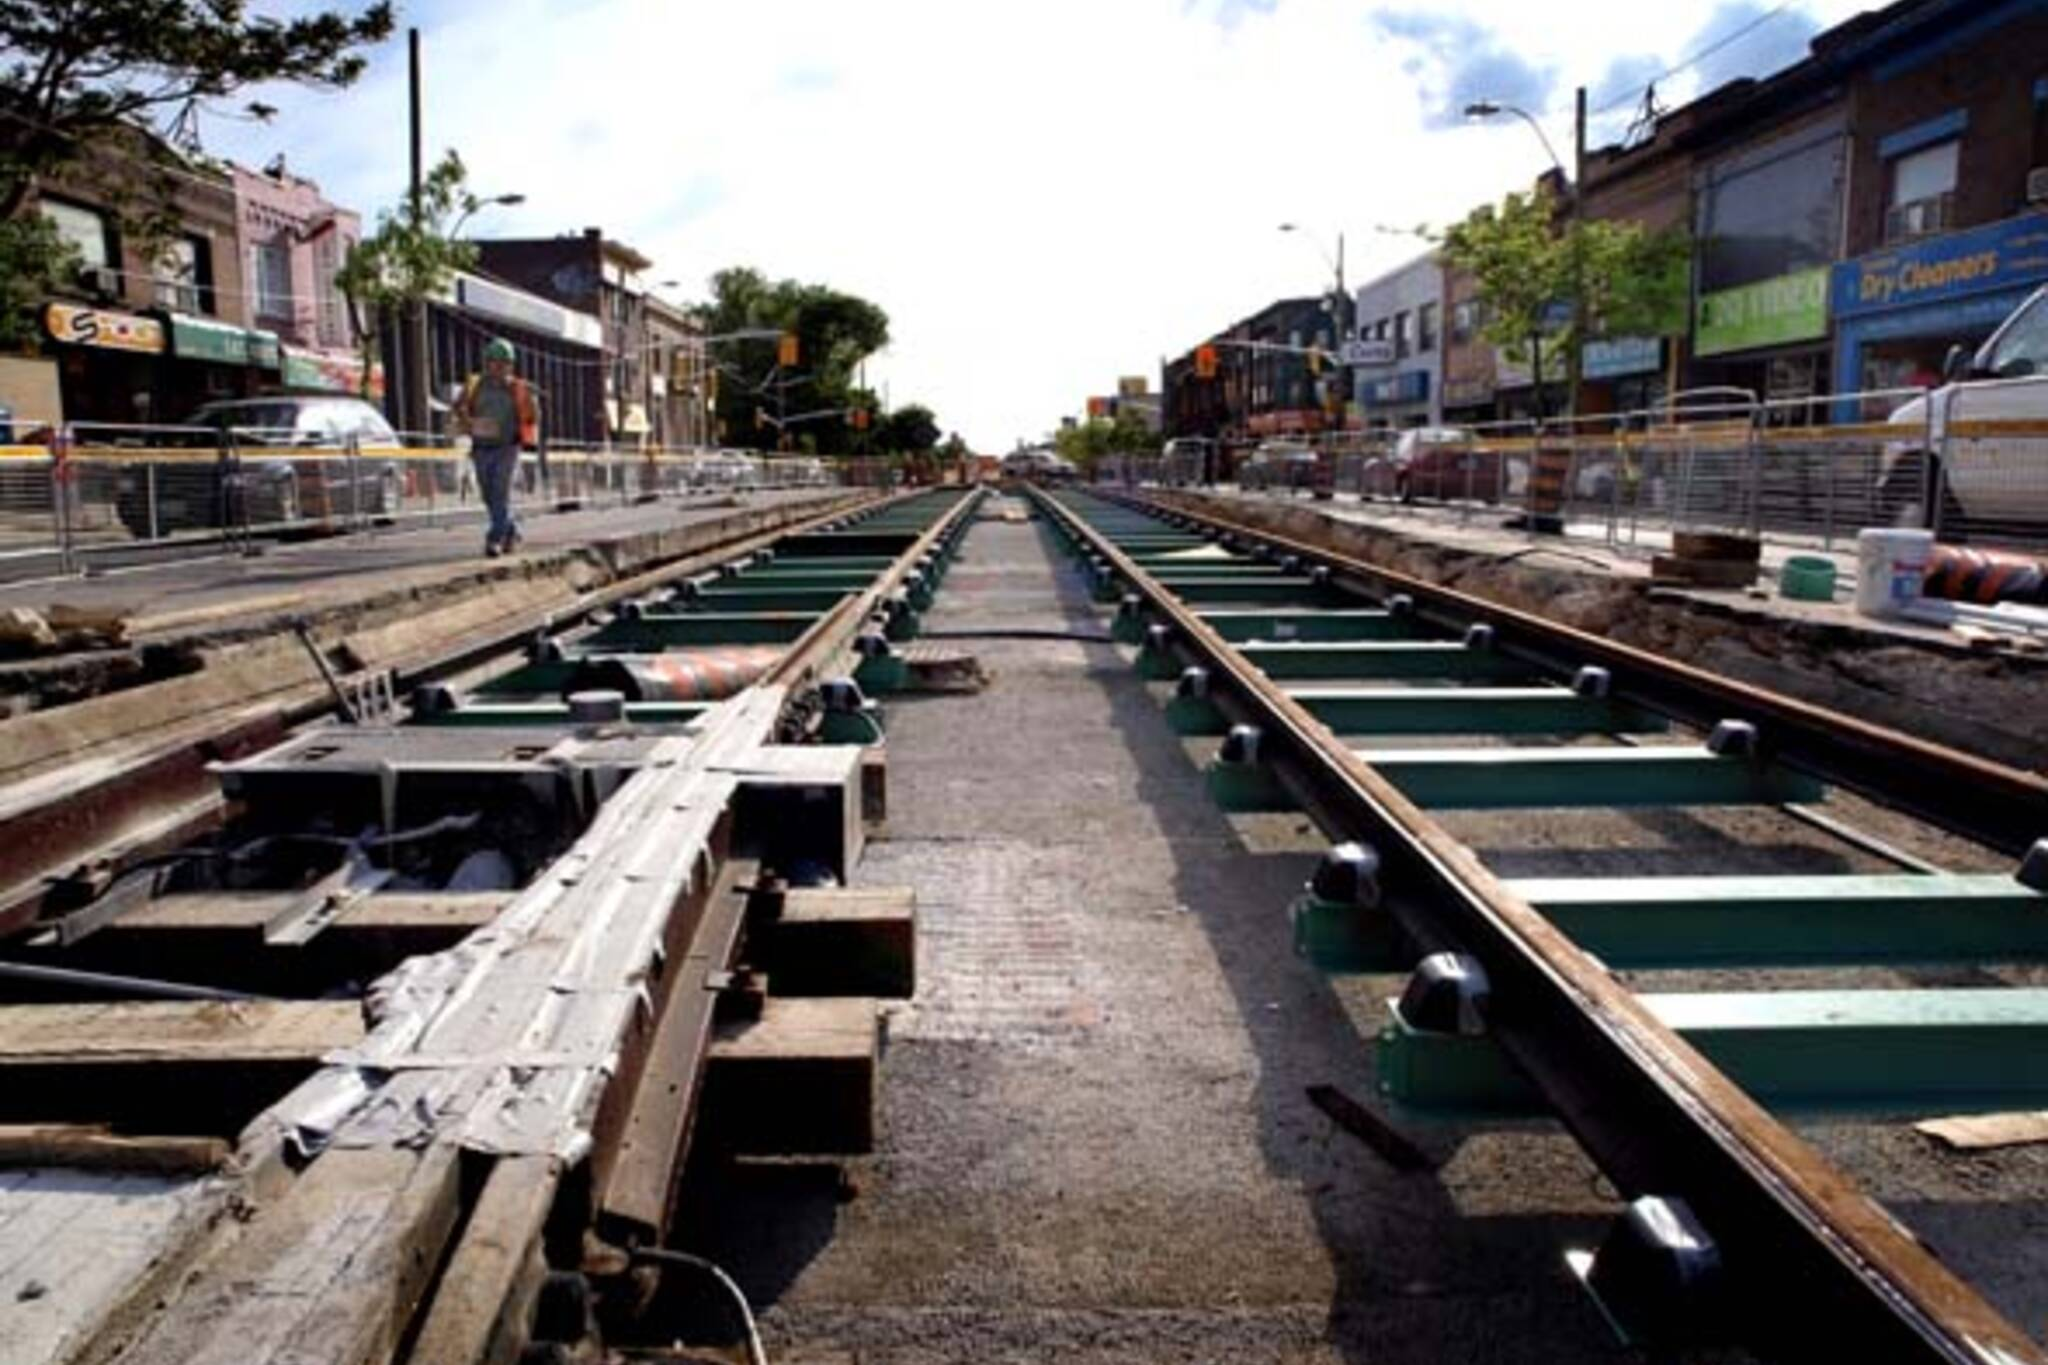 The St. Clair LRT